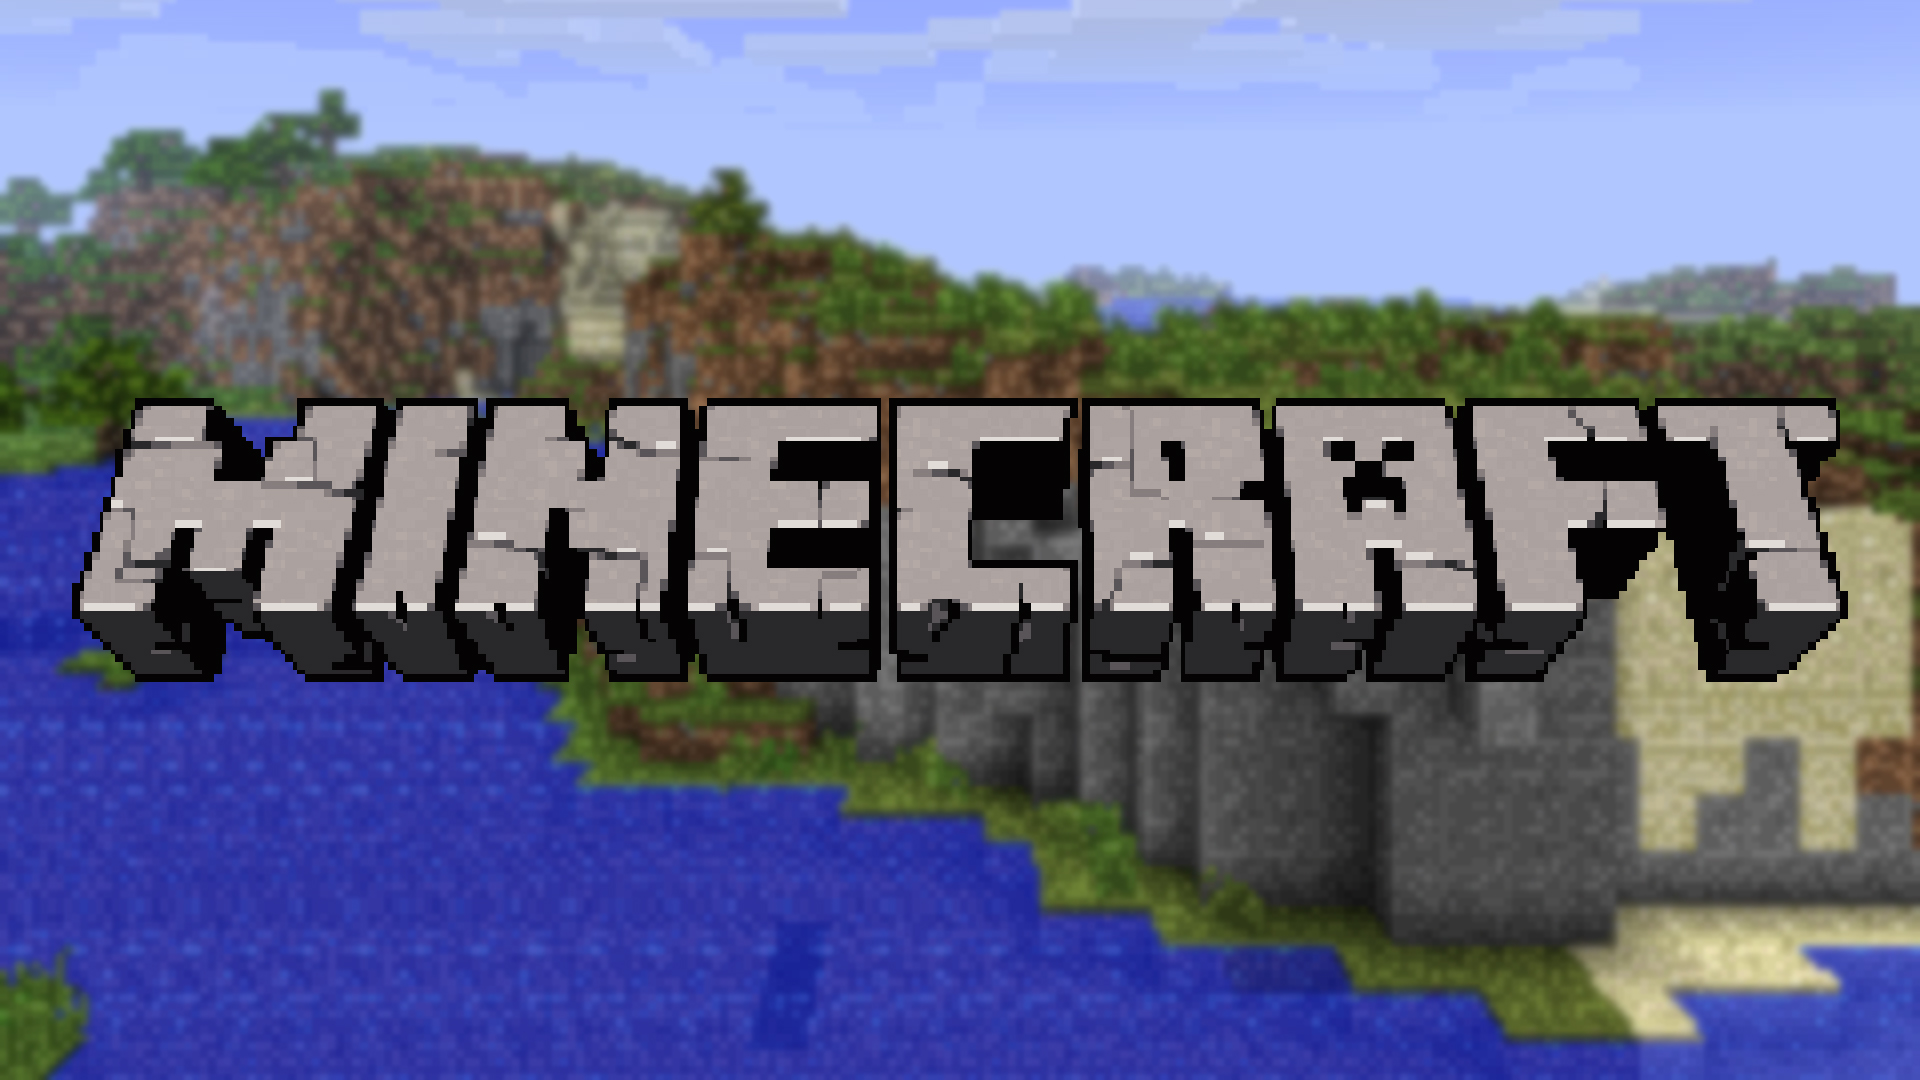 minecraft logo wallpaper by averagejoeftw fan art wallpaper games been 1920x1080